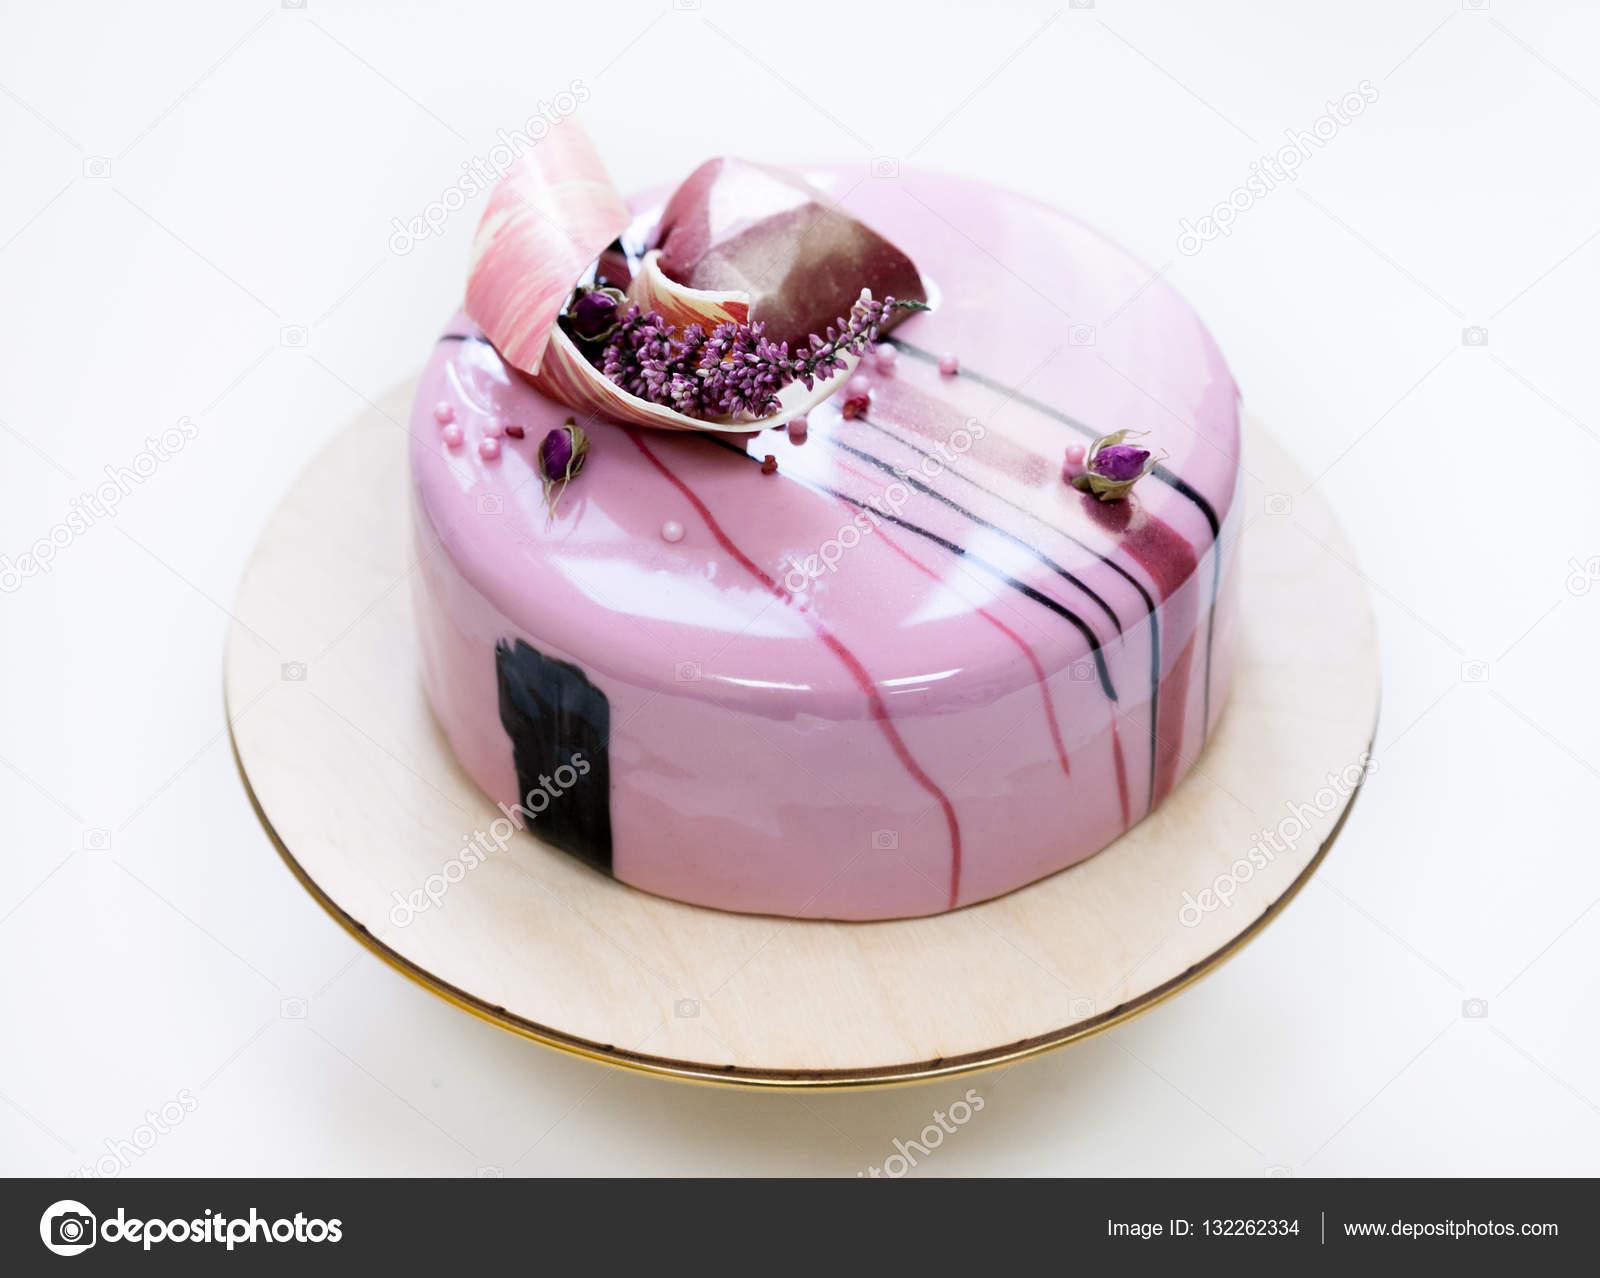 torta mousse rosa minimalista con cubierta con espejo